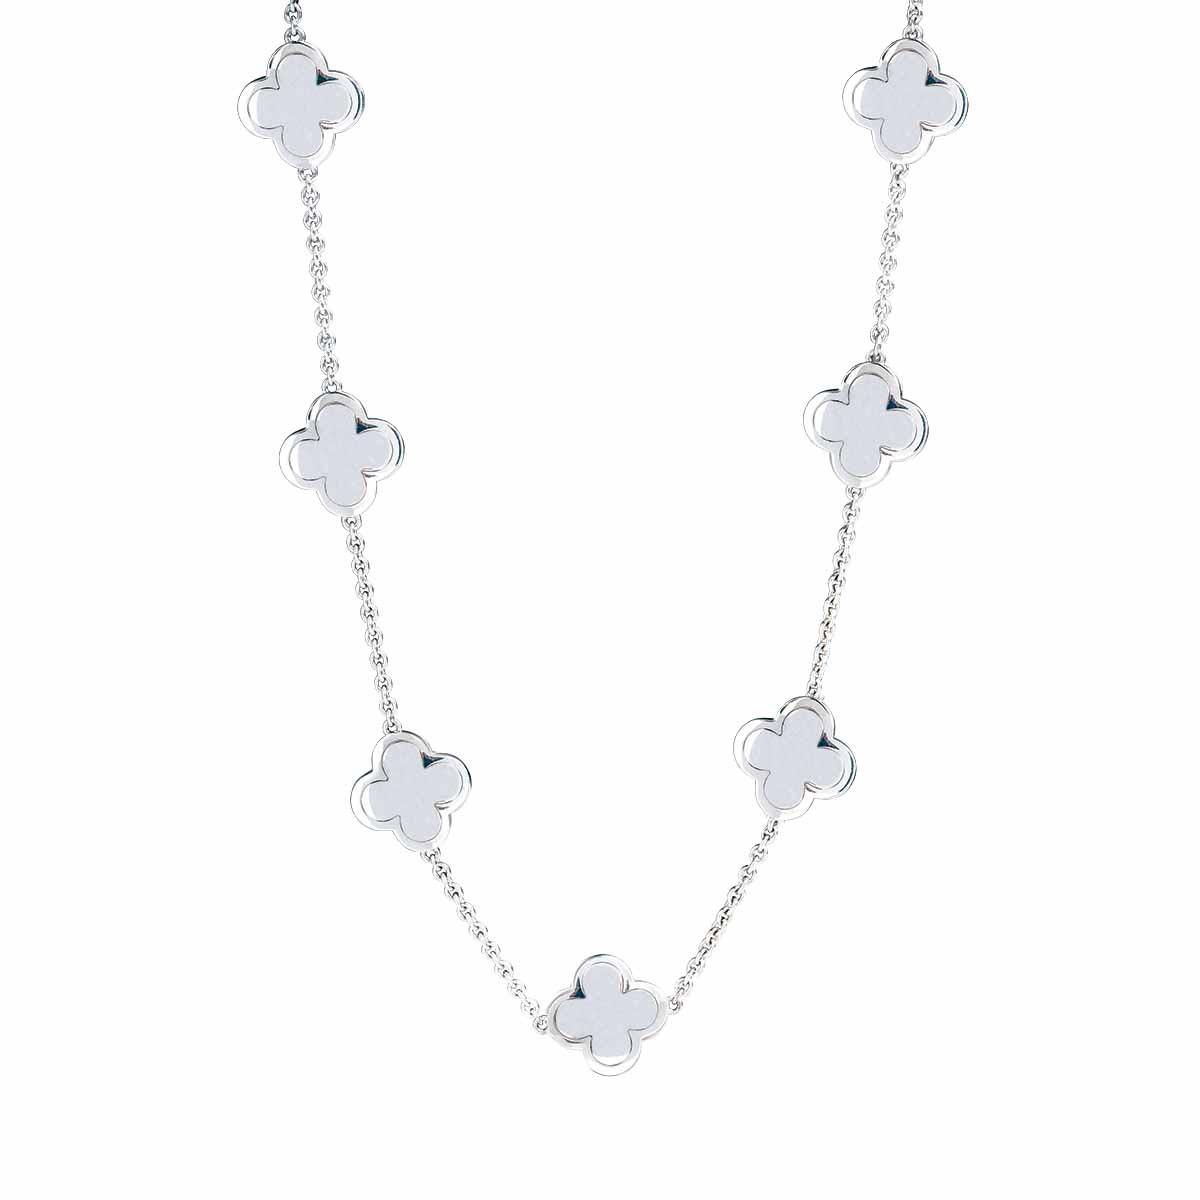 Vintage Van Cleef & Arpels Alhambra Choker Necklace